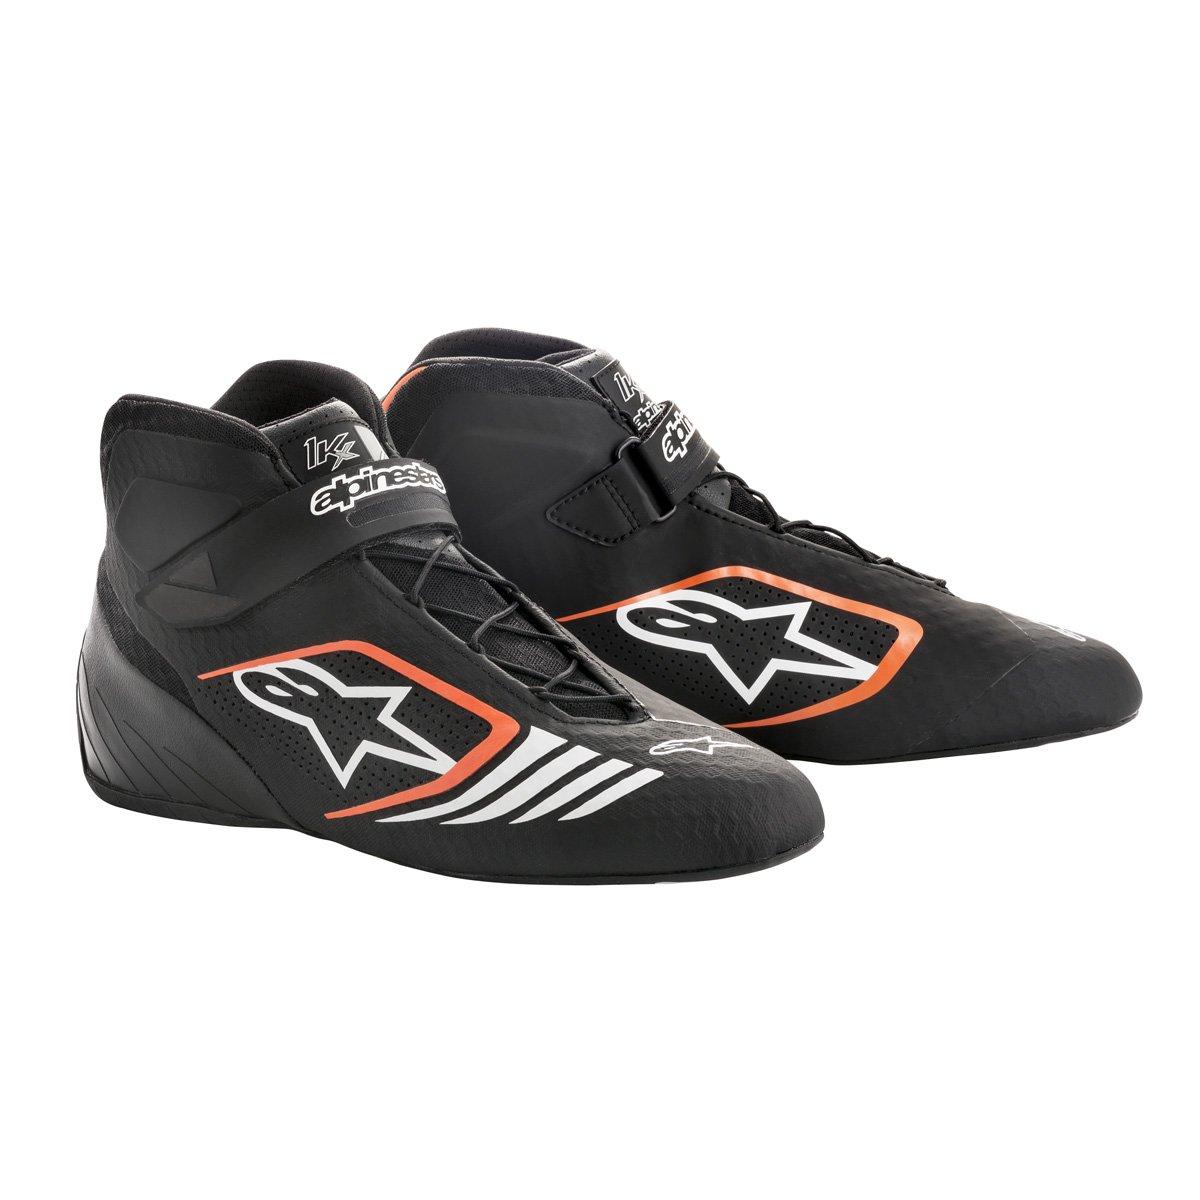 Alpinestars 2712118-156-12 Tech 1-KX Shoes, Black/Orange Fluorescent, Size 12